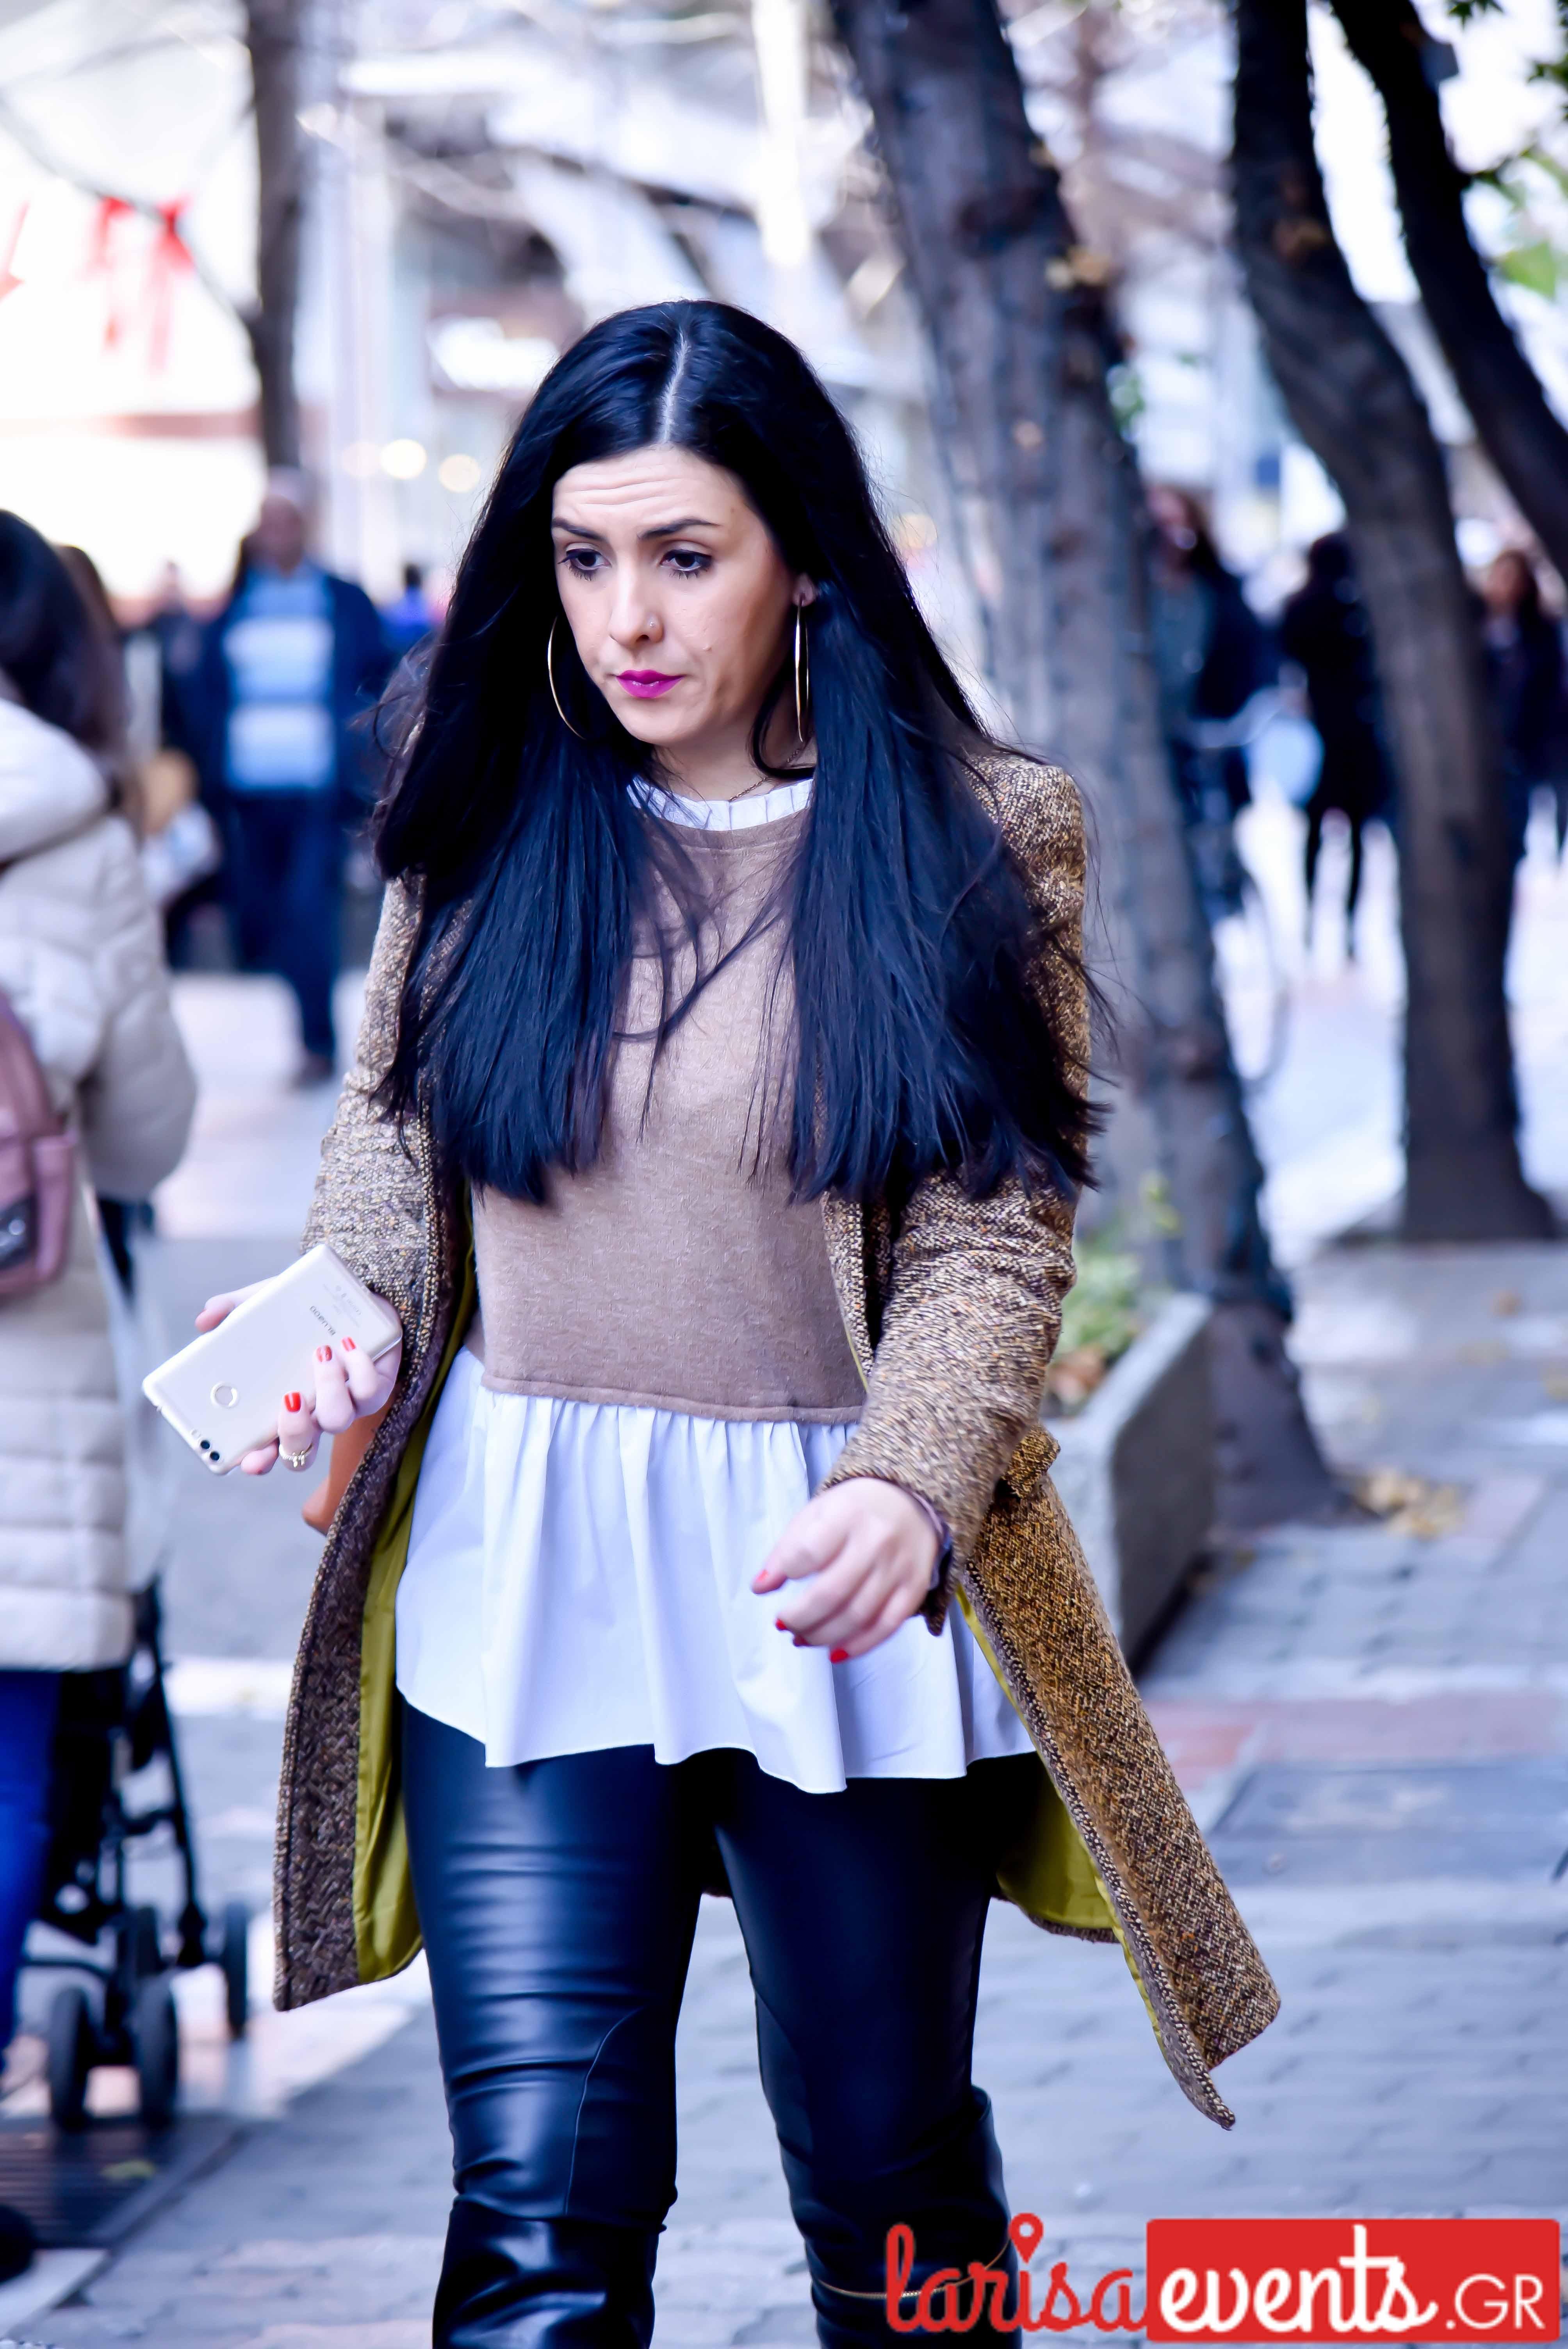 LAZ 7411 - Λάρισα's Street Style | Οι γυναίκες της πόλης σε street style clicks!